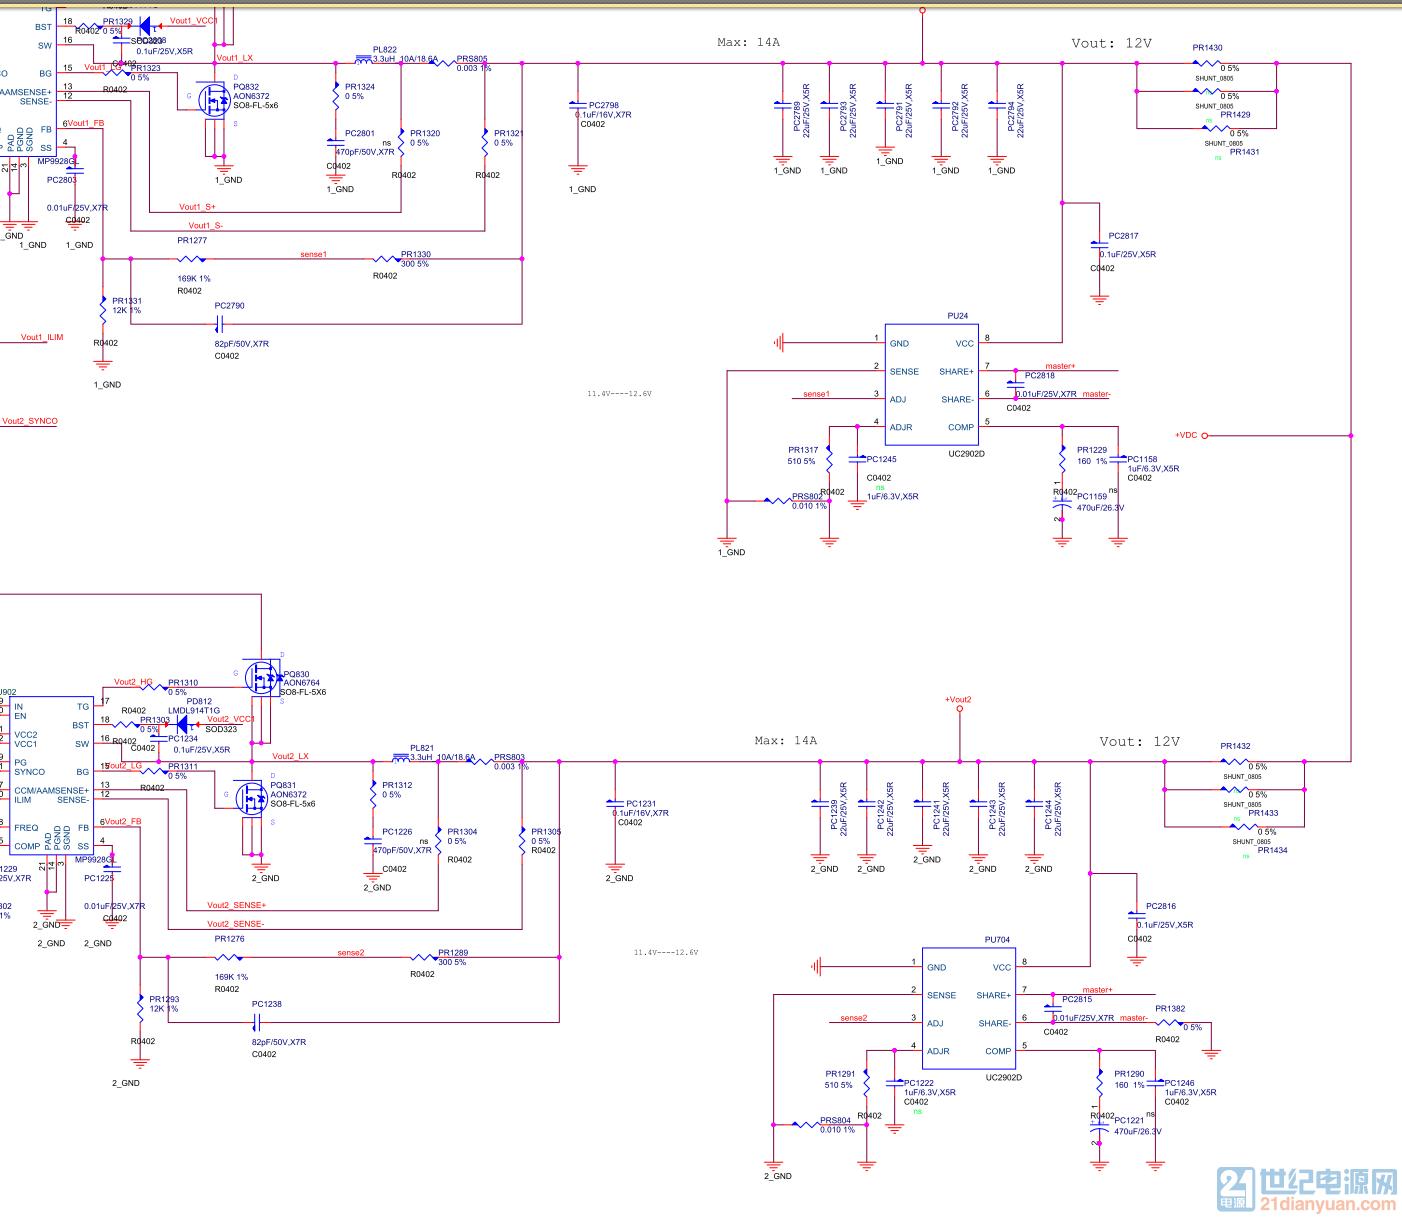 UC3902内部逻辑框图如上图所示,各管脚功能如下: SENSE端为电流检测信号端,在模块输出负端接一个取样电阻,可以得到一个与模块输出电流成比例的负信号,该信号引入2脚,通过电流检测放大器(current sense amplifier)得到一个40倍放大的电压输出(正值)。这个值就是我在前面各种均流方式里一直提到的值V1。如果模块满载输出,期望在均流母线上的到4V的电压,那么取样电阻的阻值可以计算:Rsense=4/(40*Io).